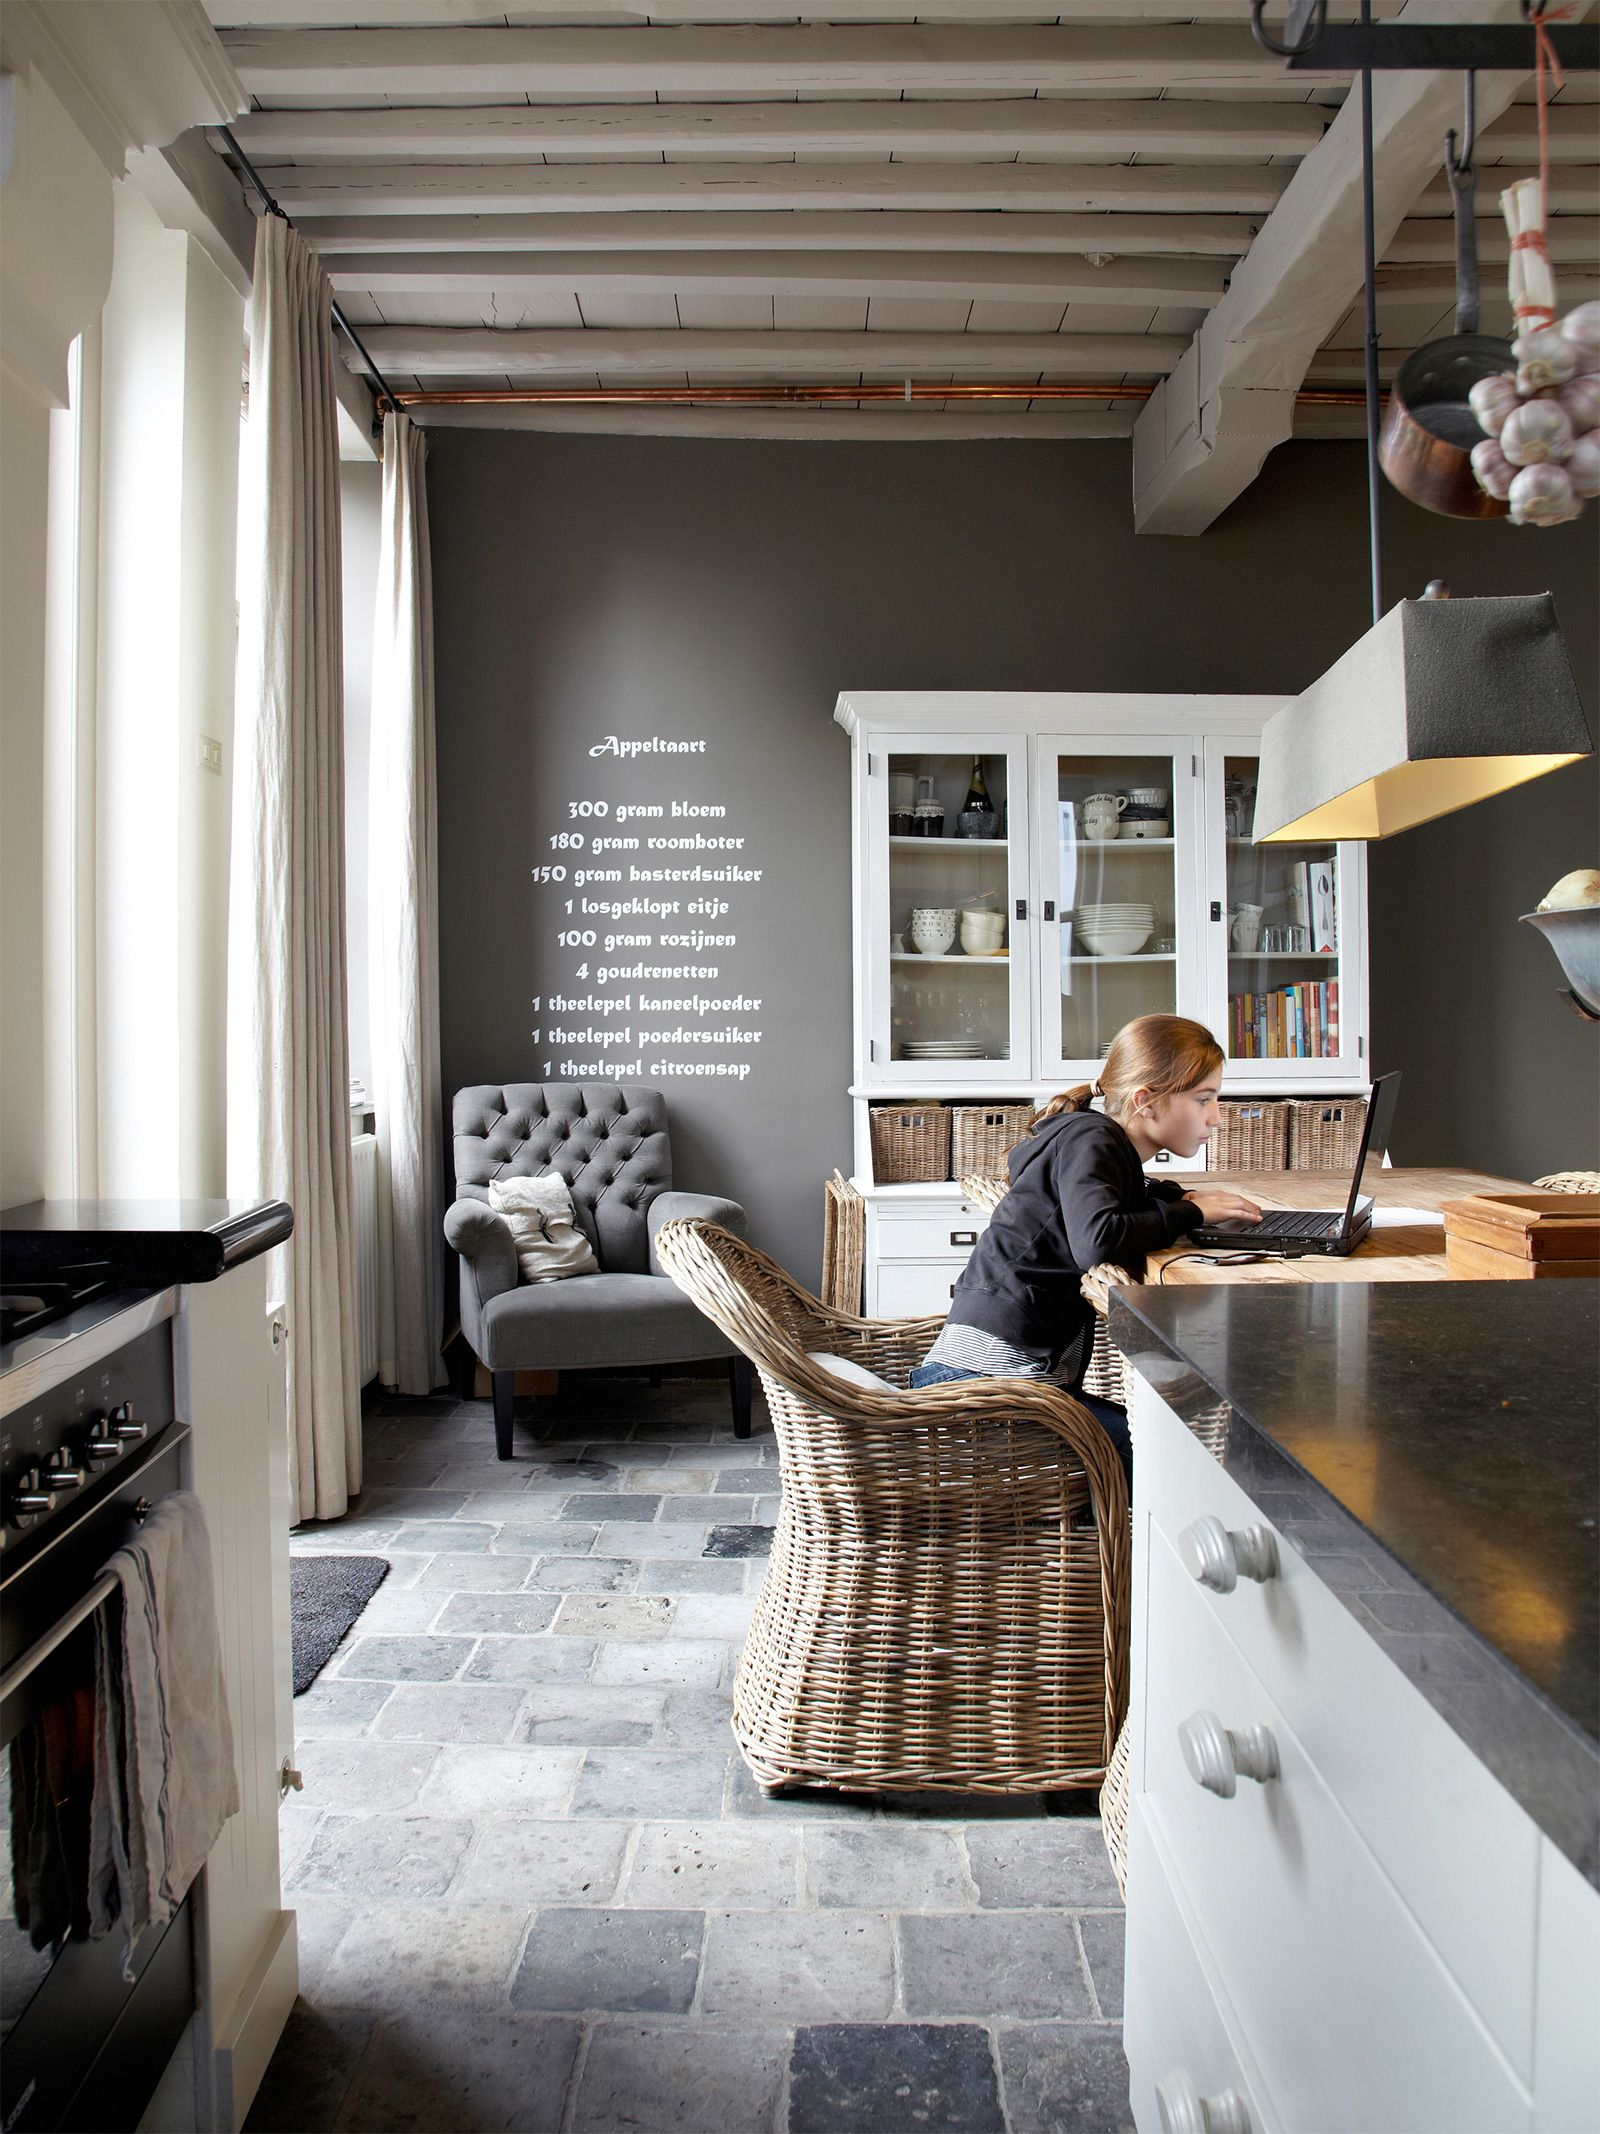 antike bodenfliesen opkamer antike terrakotta naturstein ideen h user graue fliesen. Black Bedroom Furniture Sets. Home Design Ideas